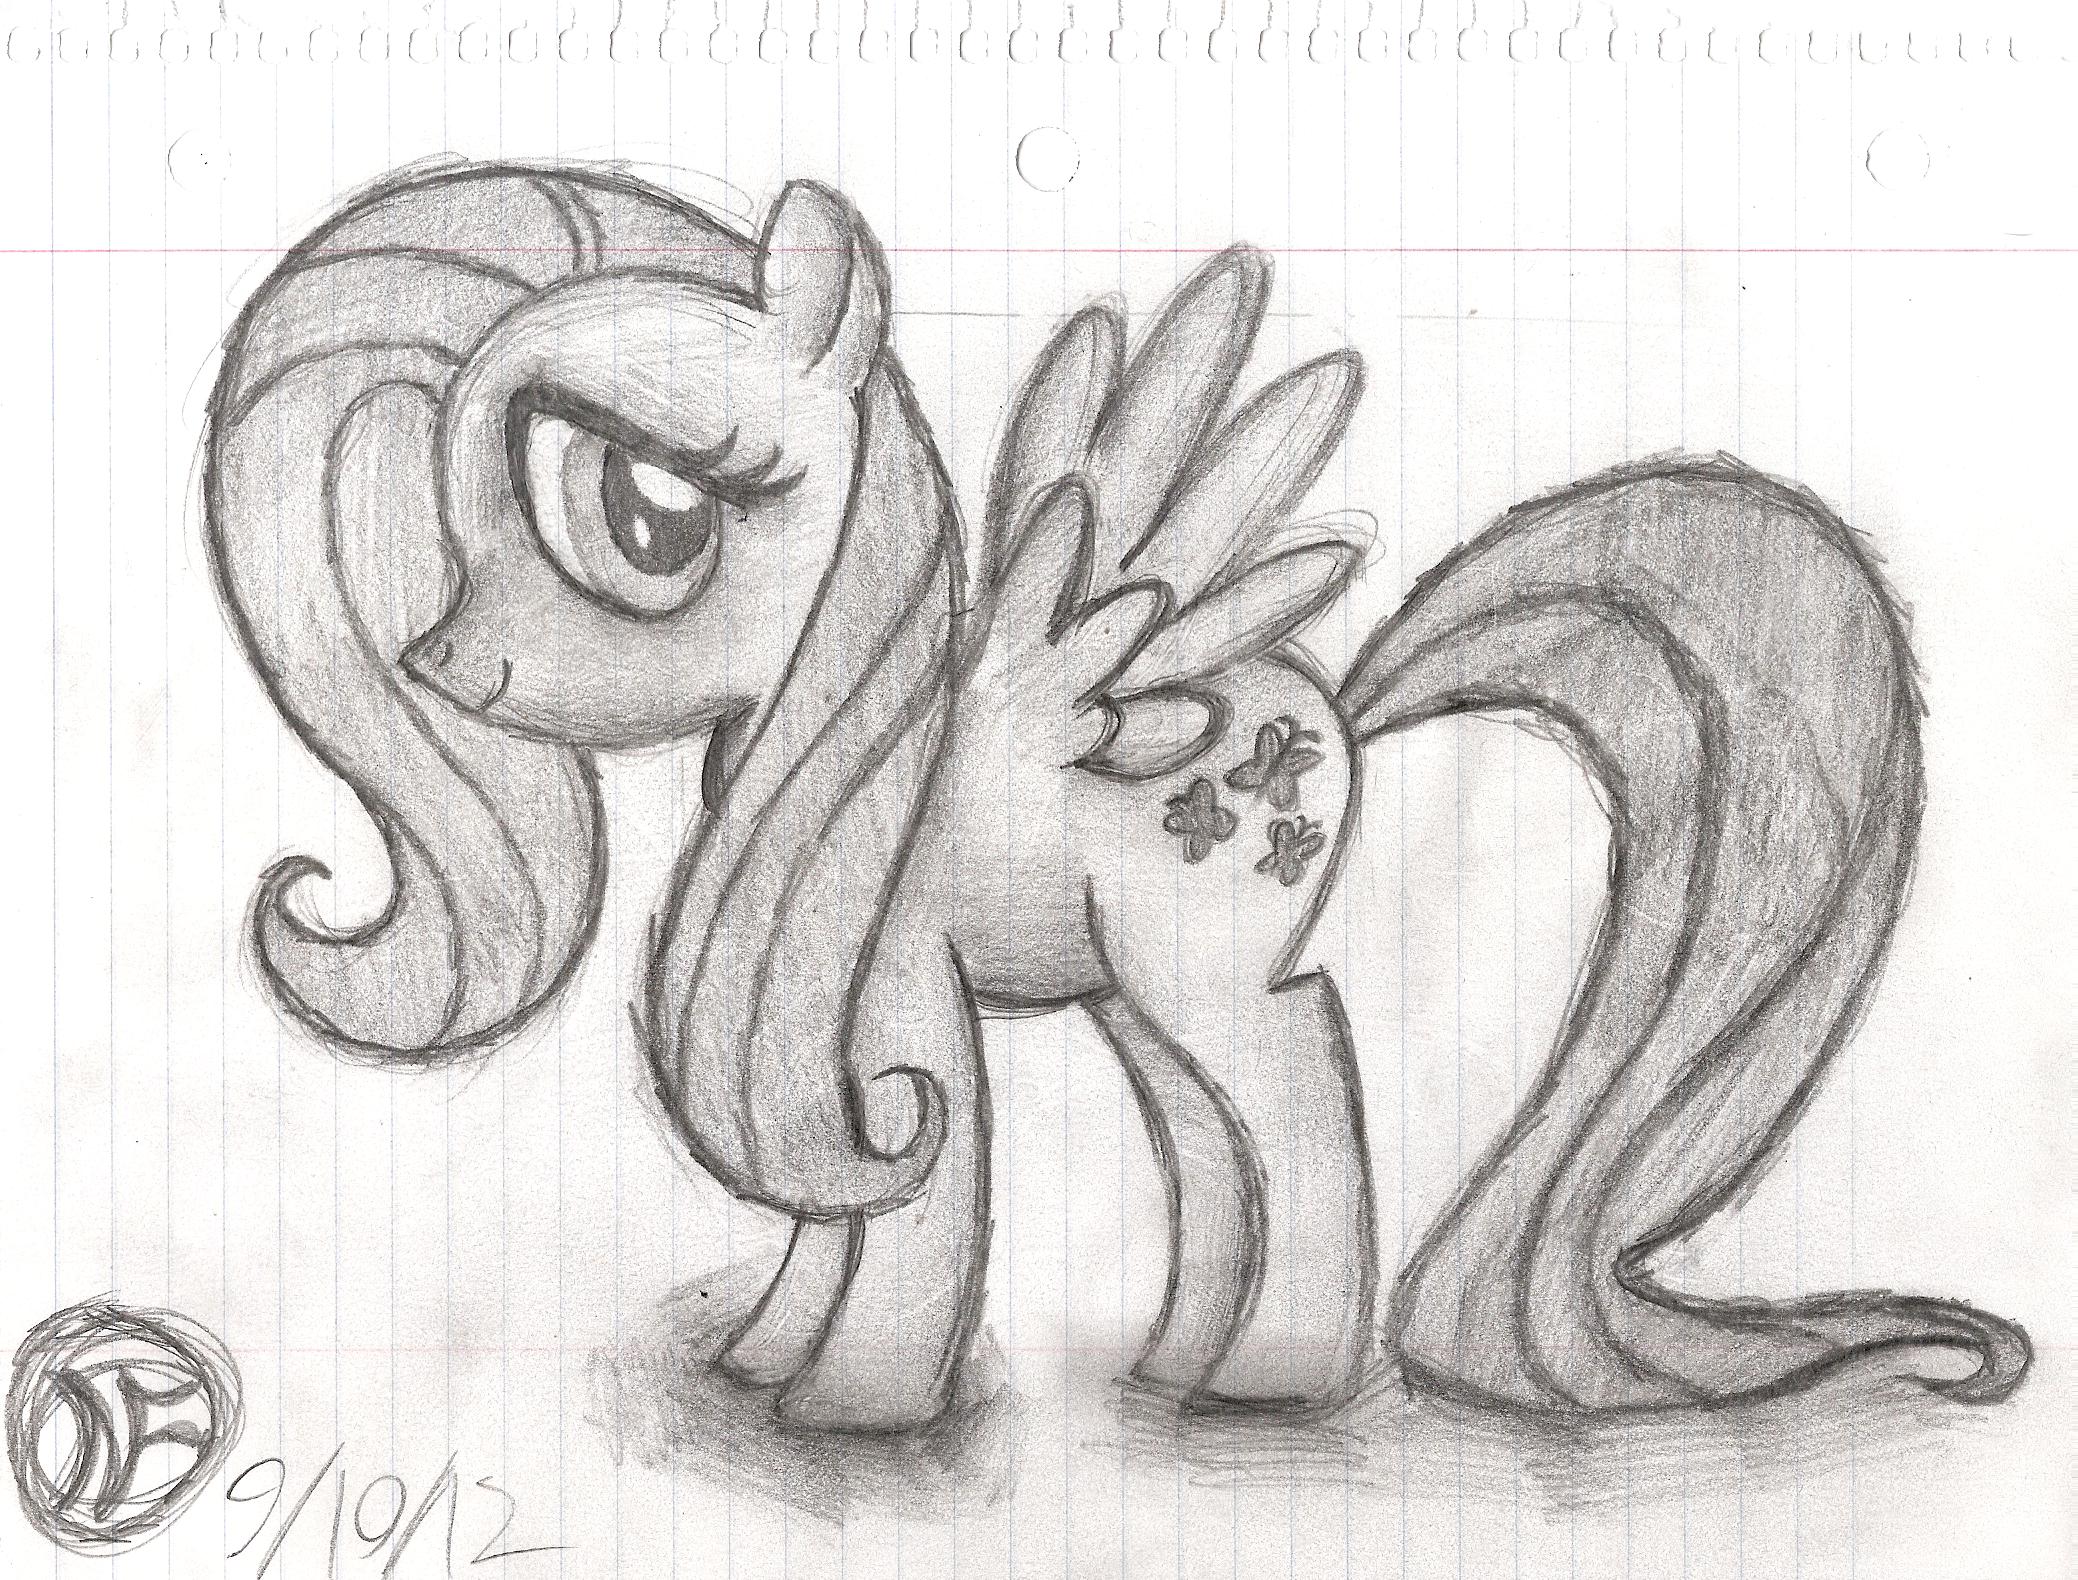 Fluttershy - Sketch by DAFORCEFilms